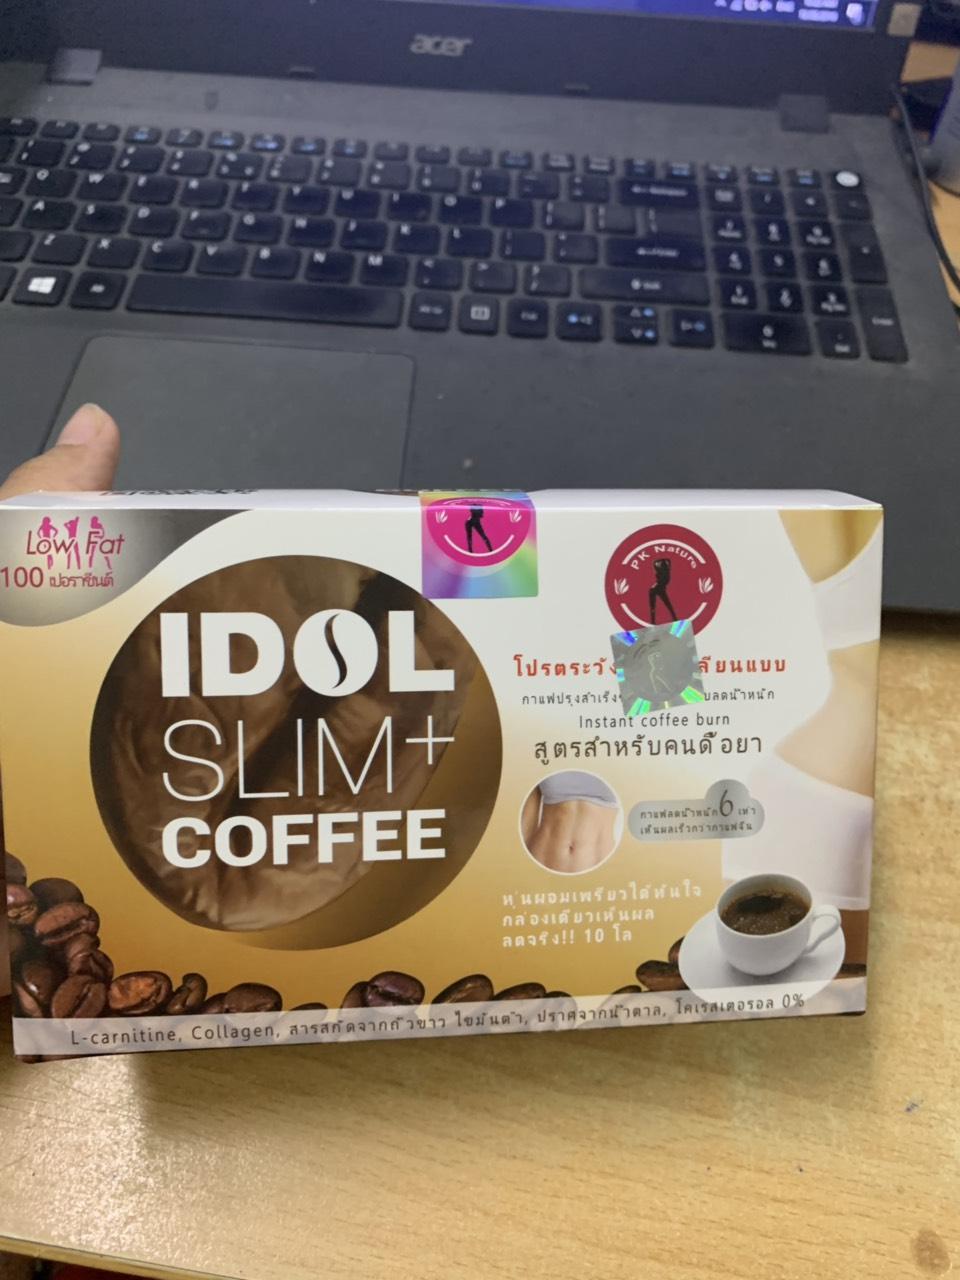 body-ca-phe-giam-can-idol-slim-coffee-thai-lan-2245